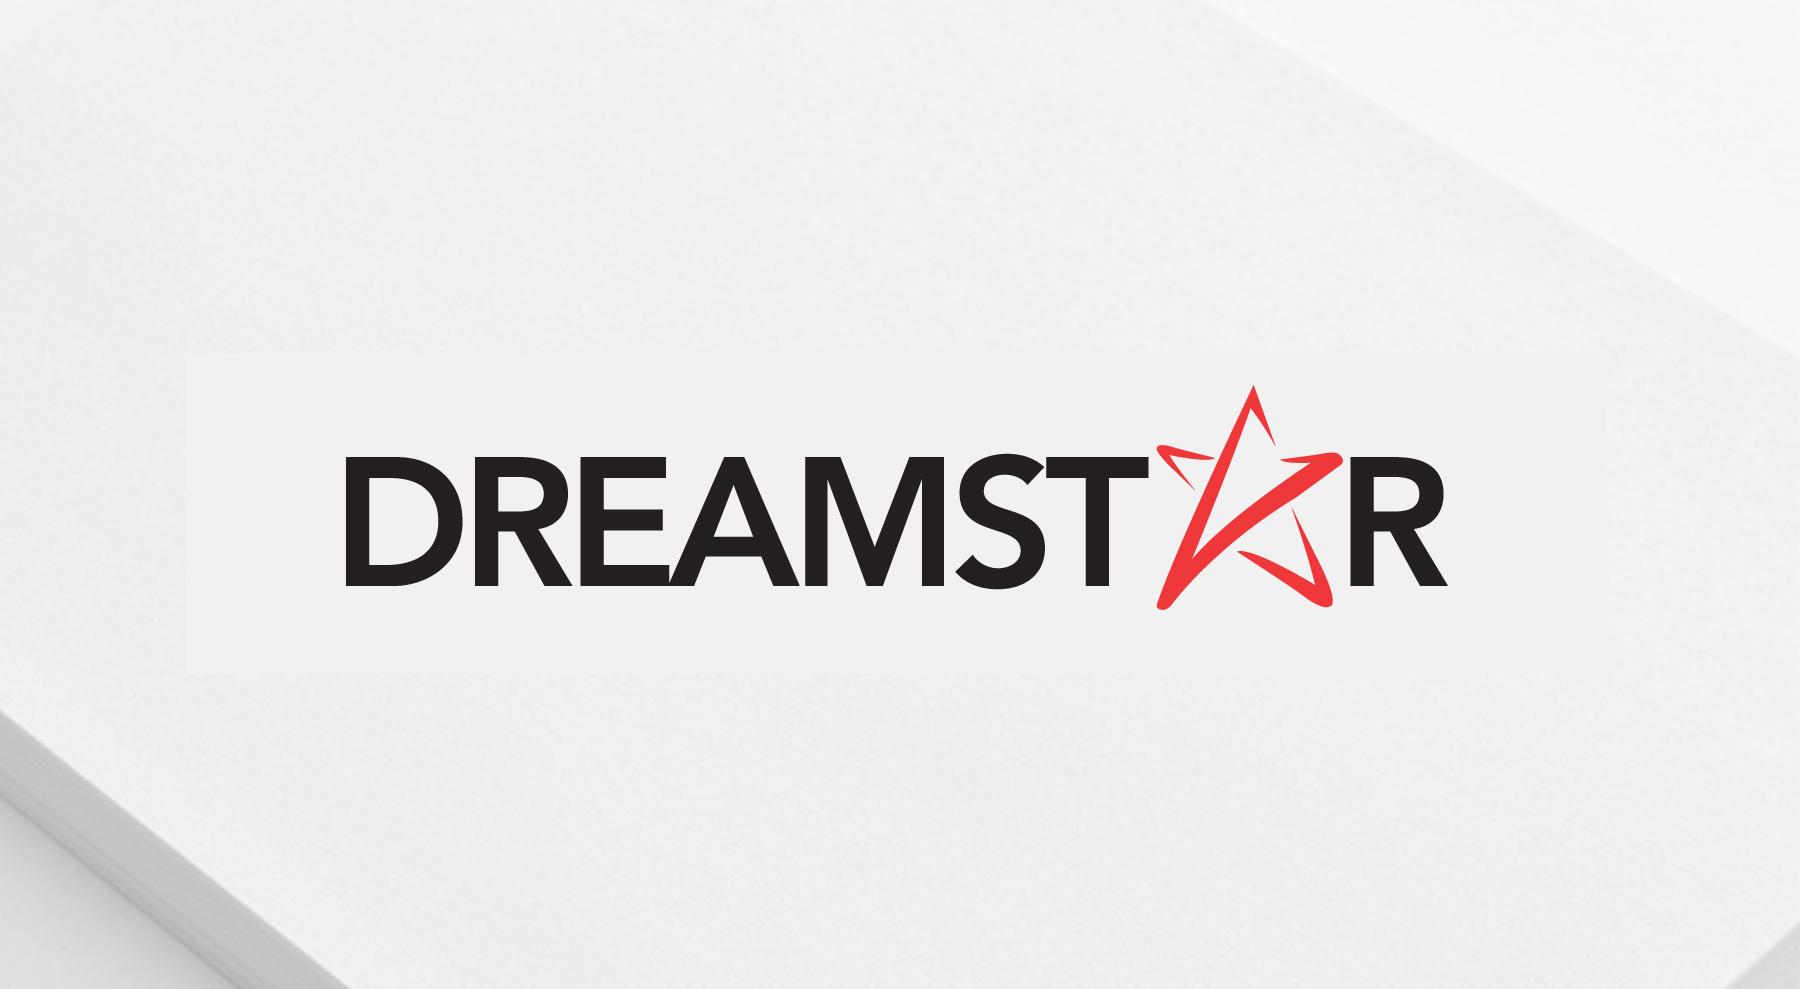 Dreamstar - Brand Identity.jpg